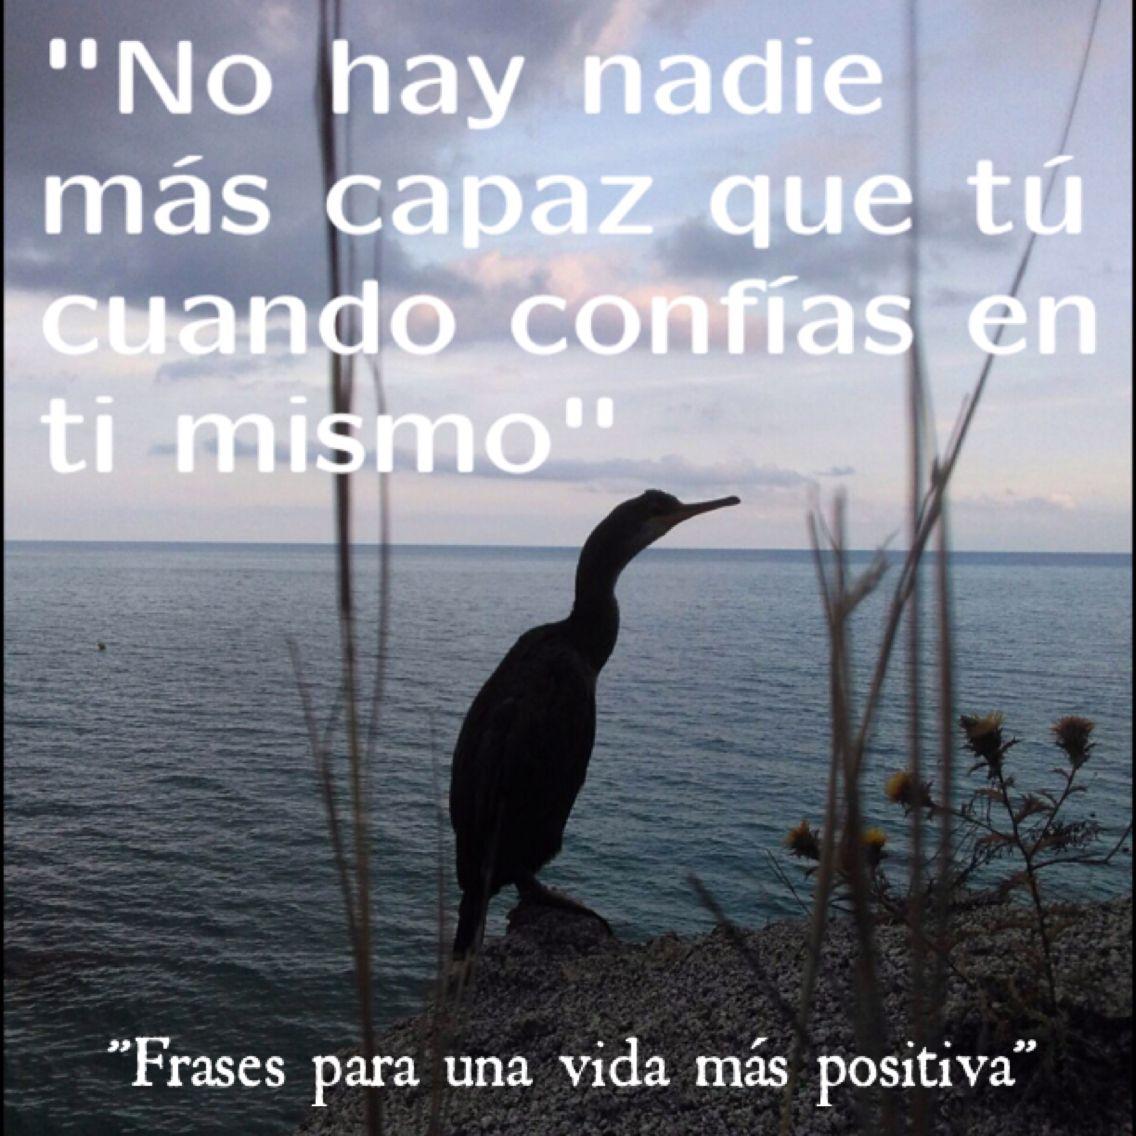 """No hay nadie"" #frases #frasespositivas #capaz #animo #tupuedes #positivo"